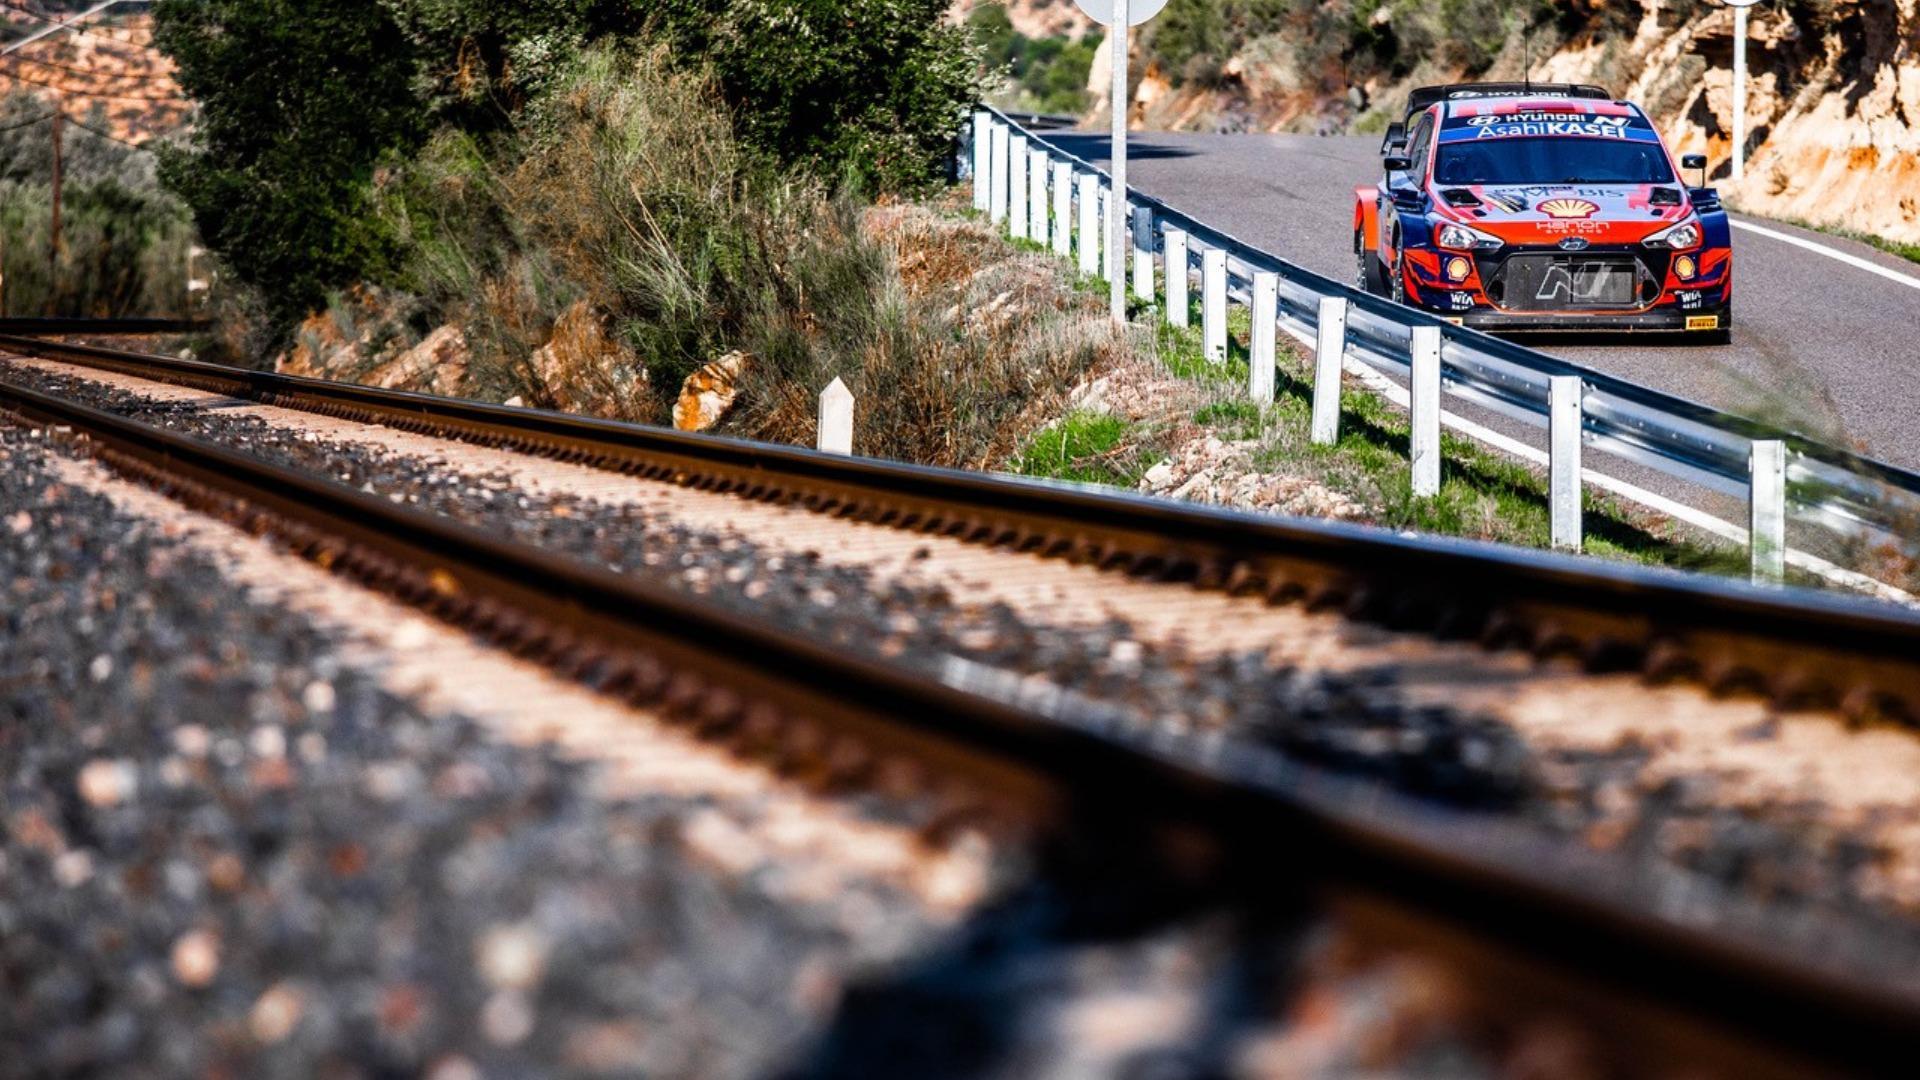 RallyRACC Catalunya - Rally de España 2021: Saturday Highlights